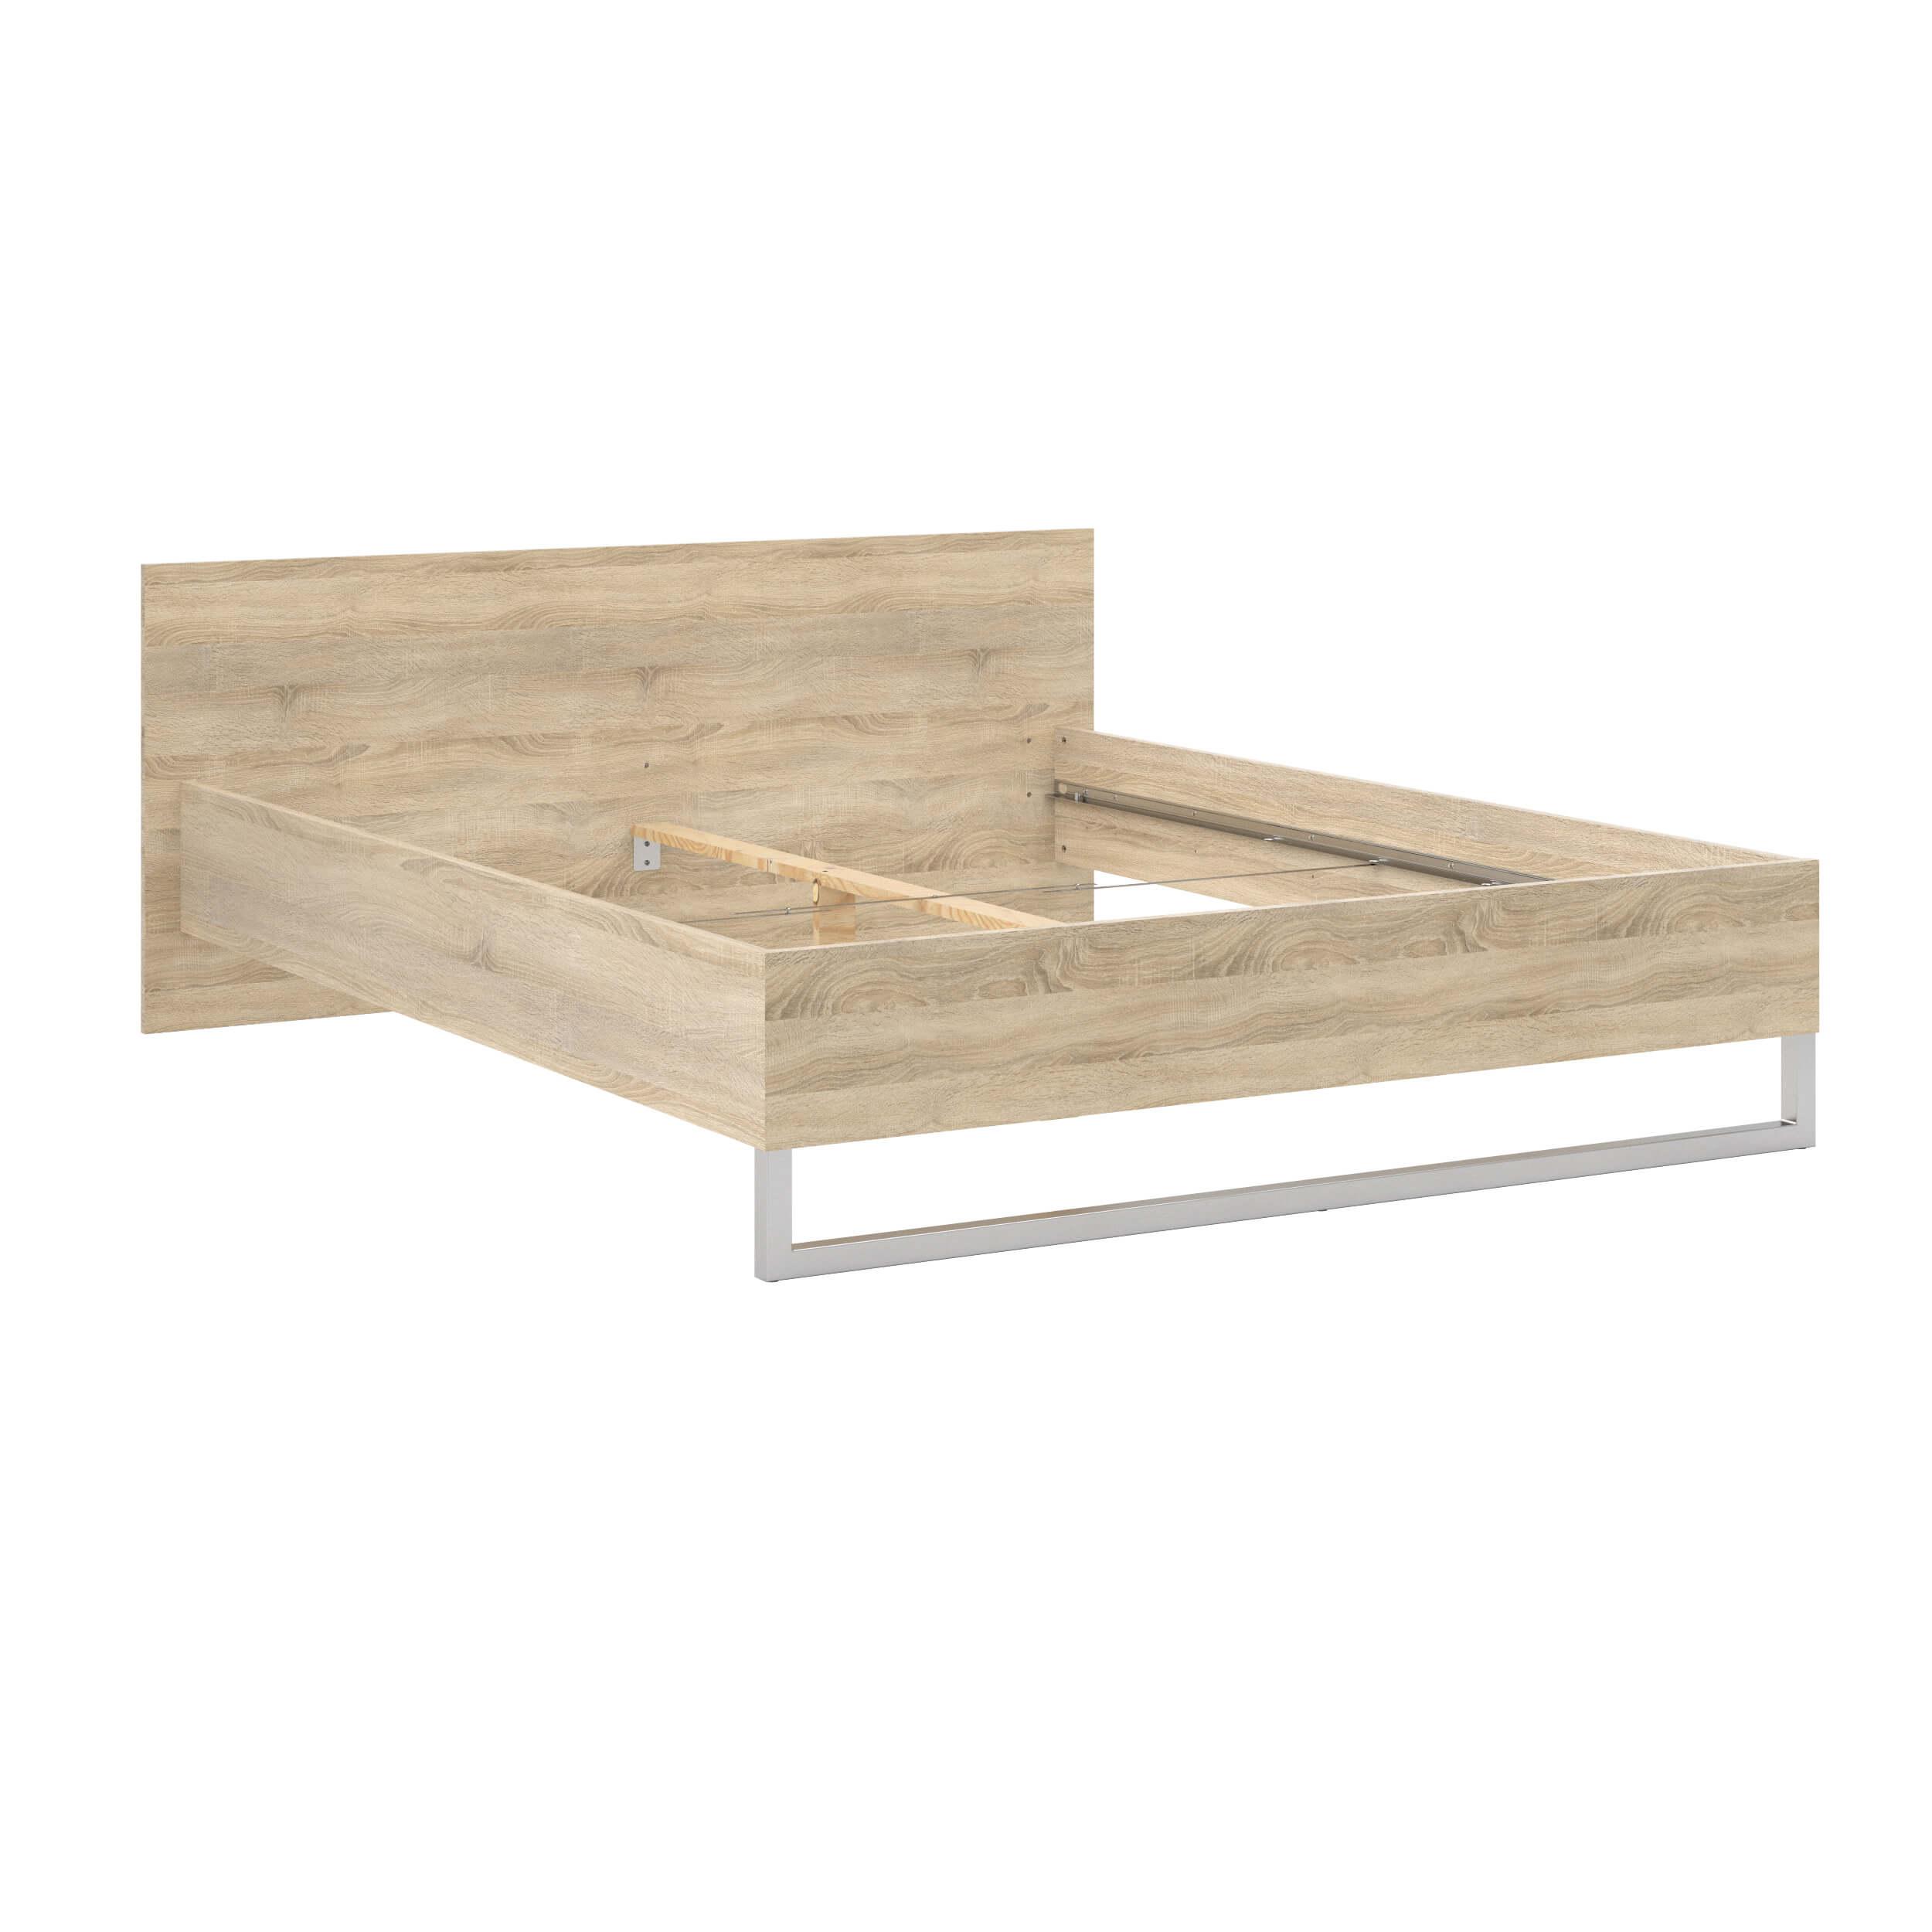 Style sengeramme - egetræsstruktur (160x200)